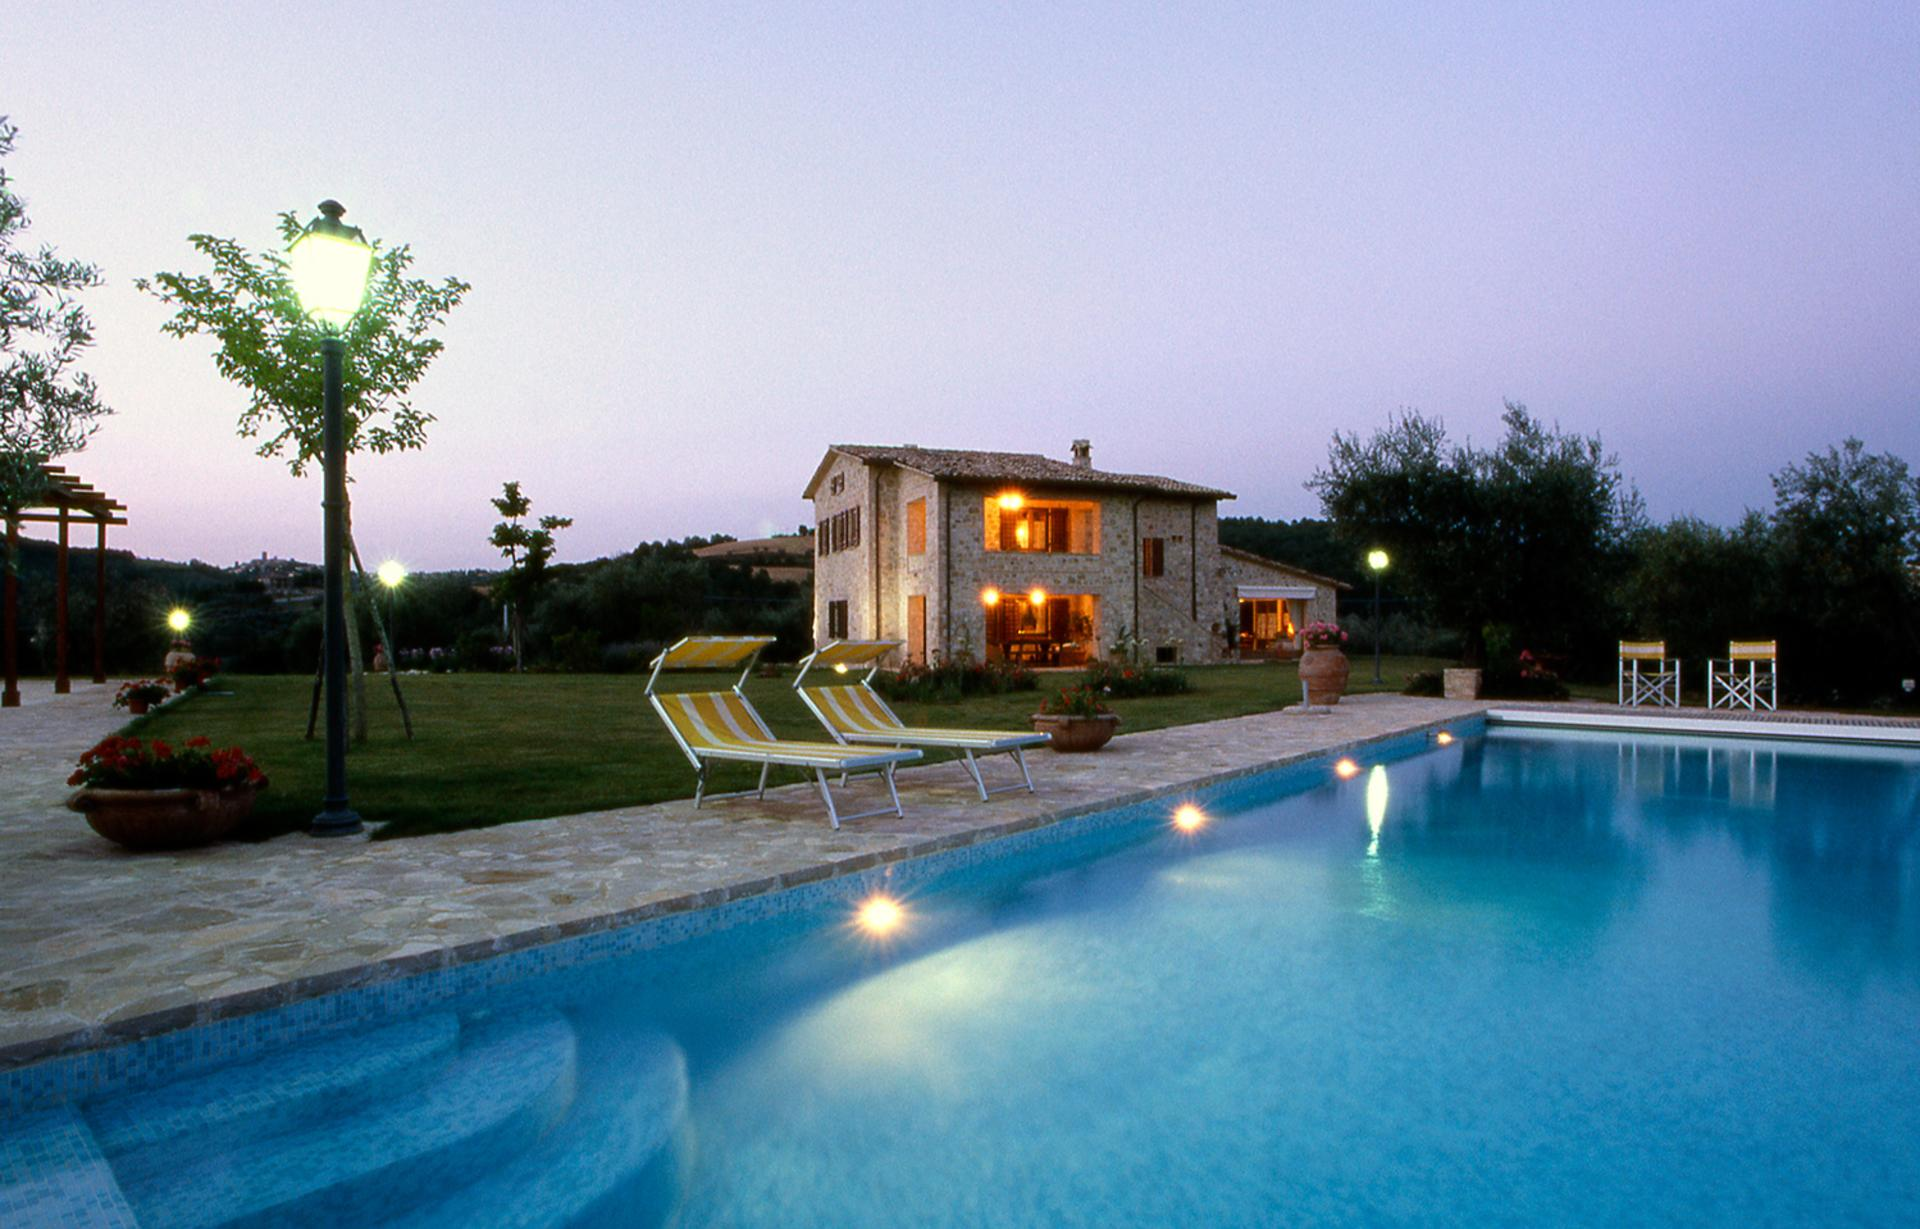 Pool 1, Lampone, Collazzone, Umbria.